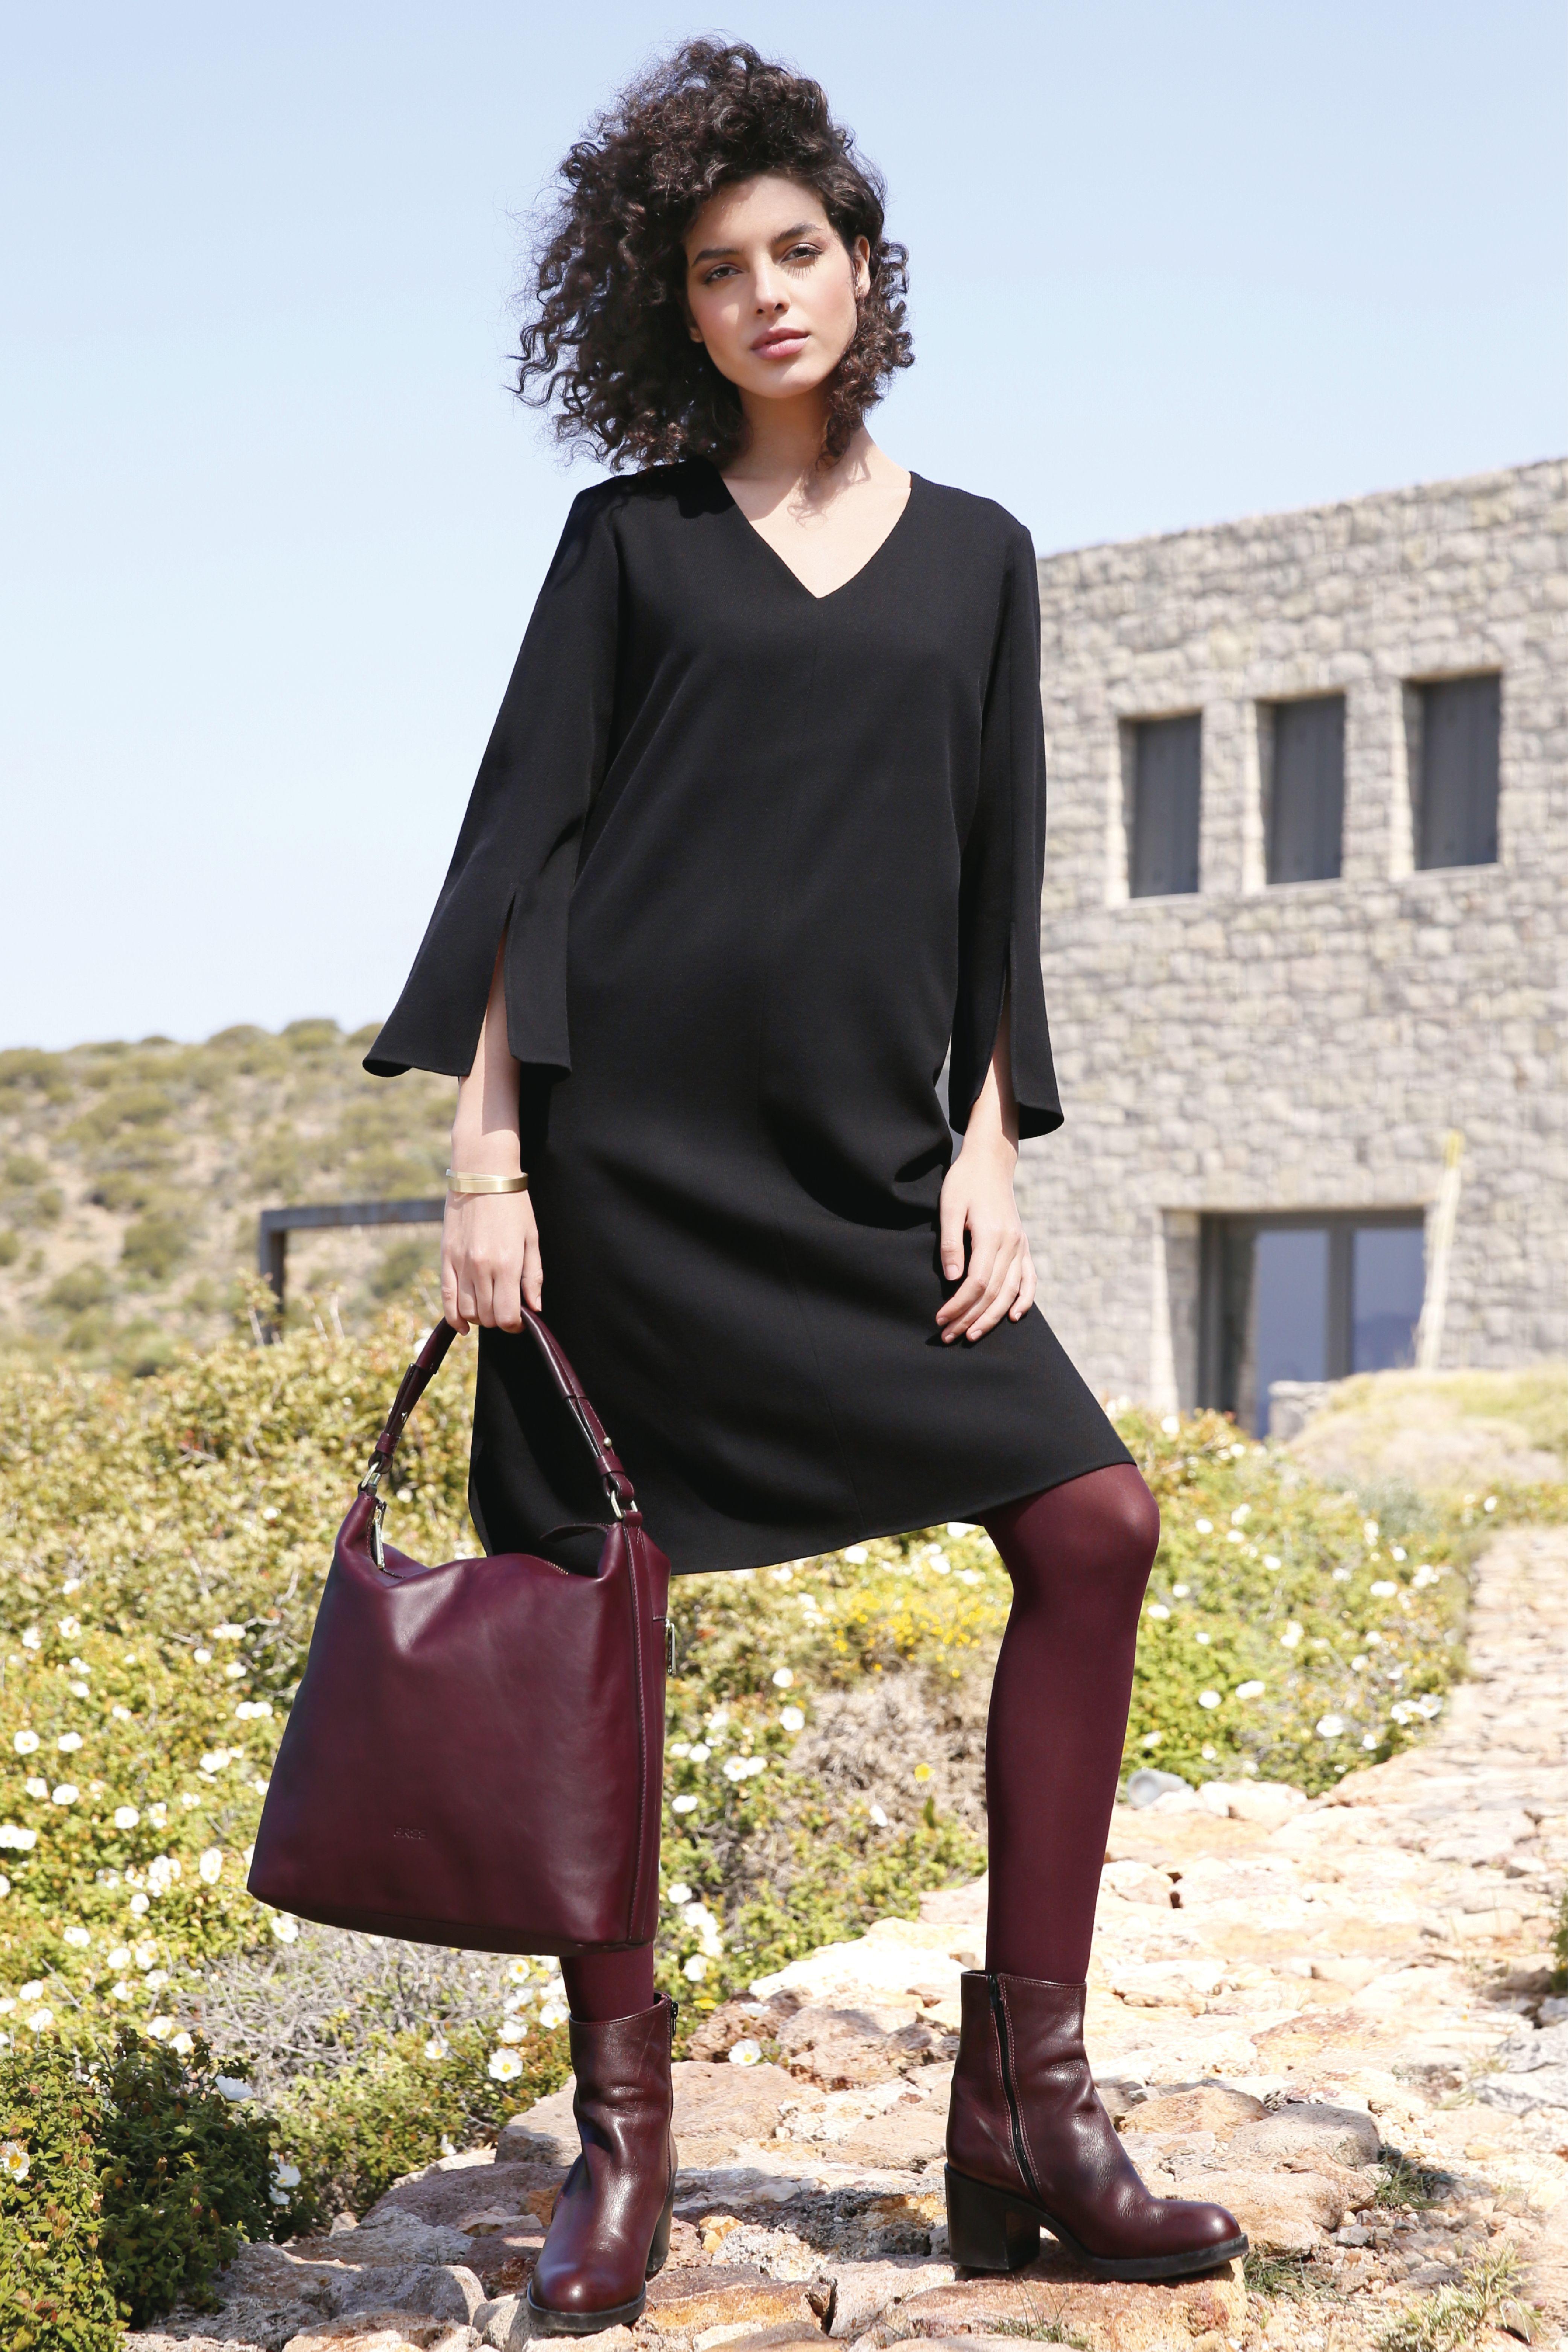 outfit inspiration - dress | kleider damen, kleider online